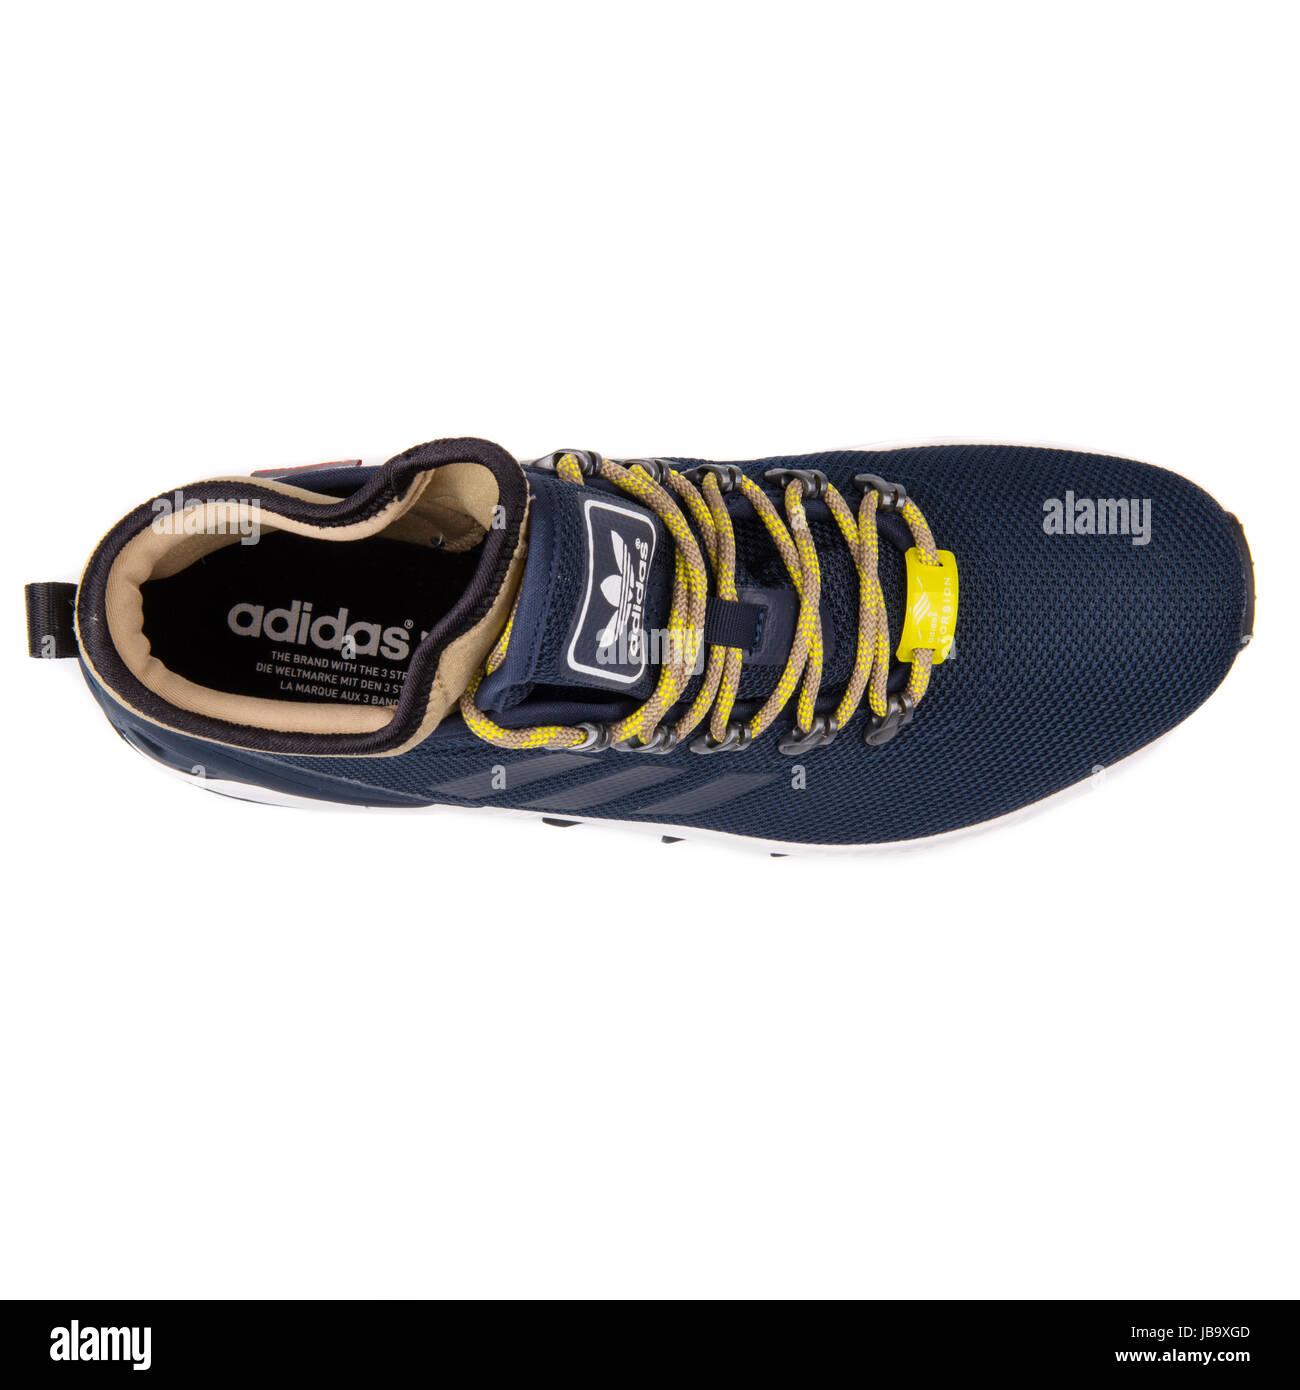 3c716dfe9 Adidas ZX Flux Winter Navy Blue Men s Sports Shoes - S82932 - Stock Image